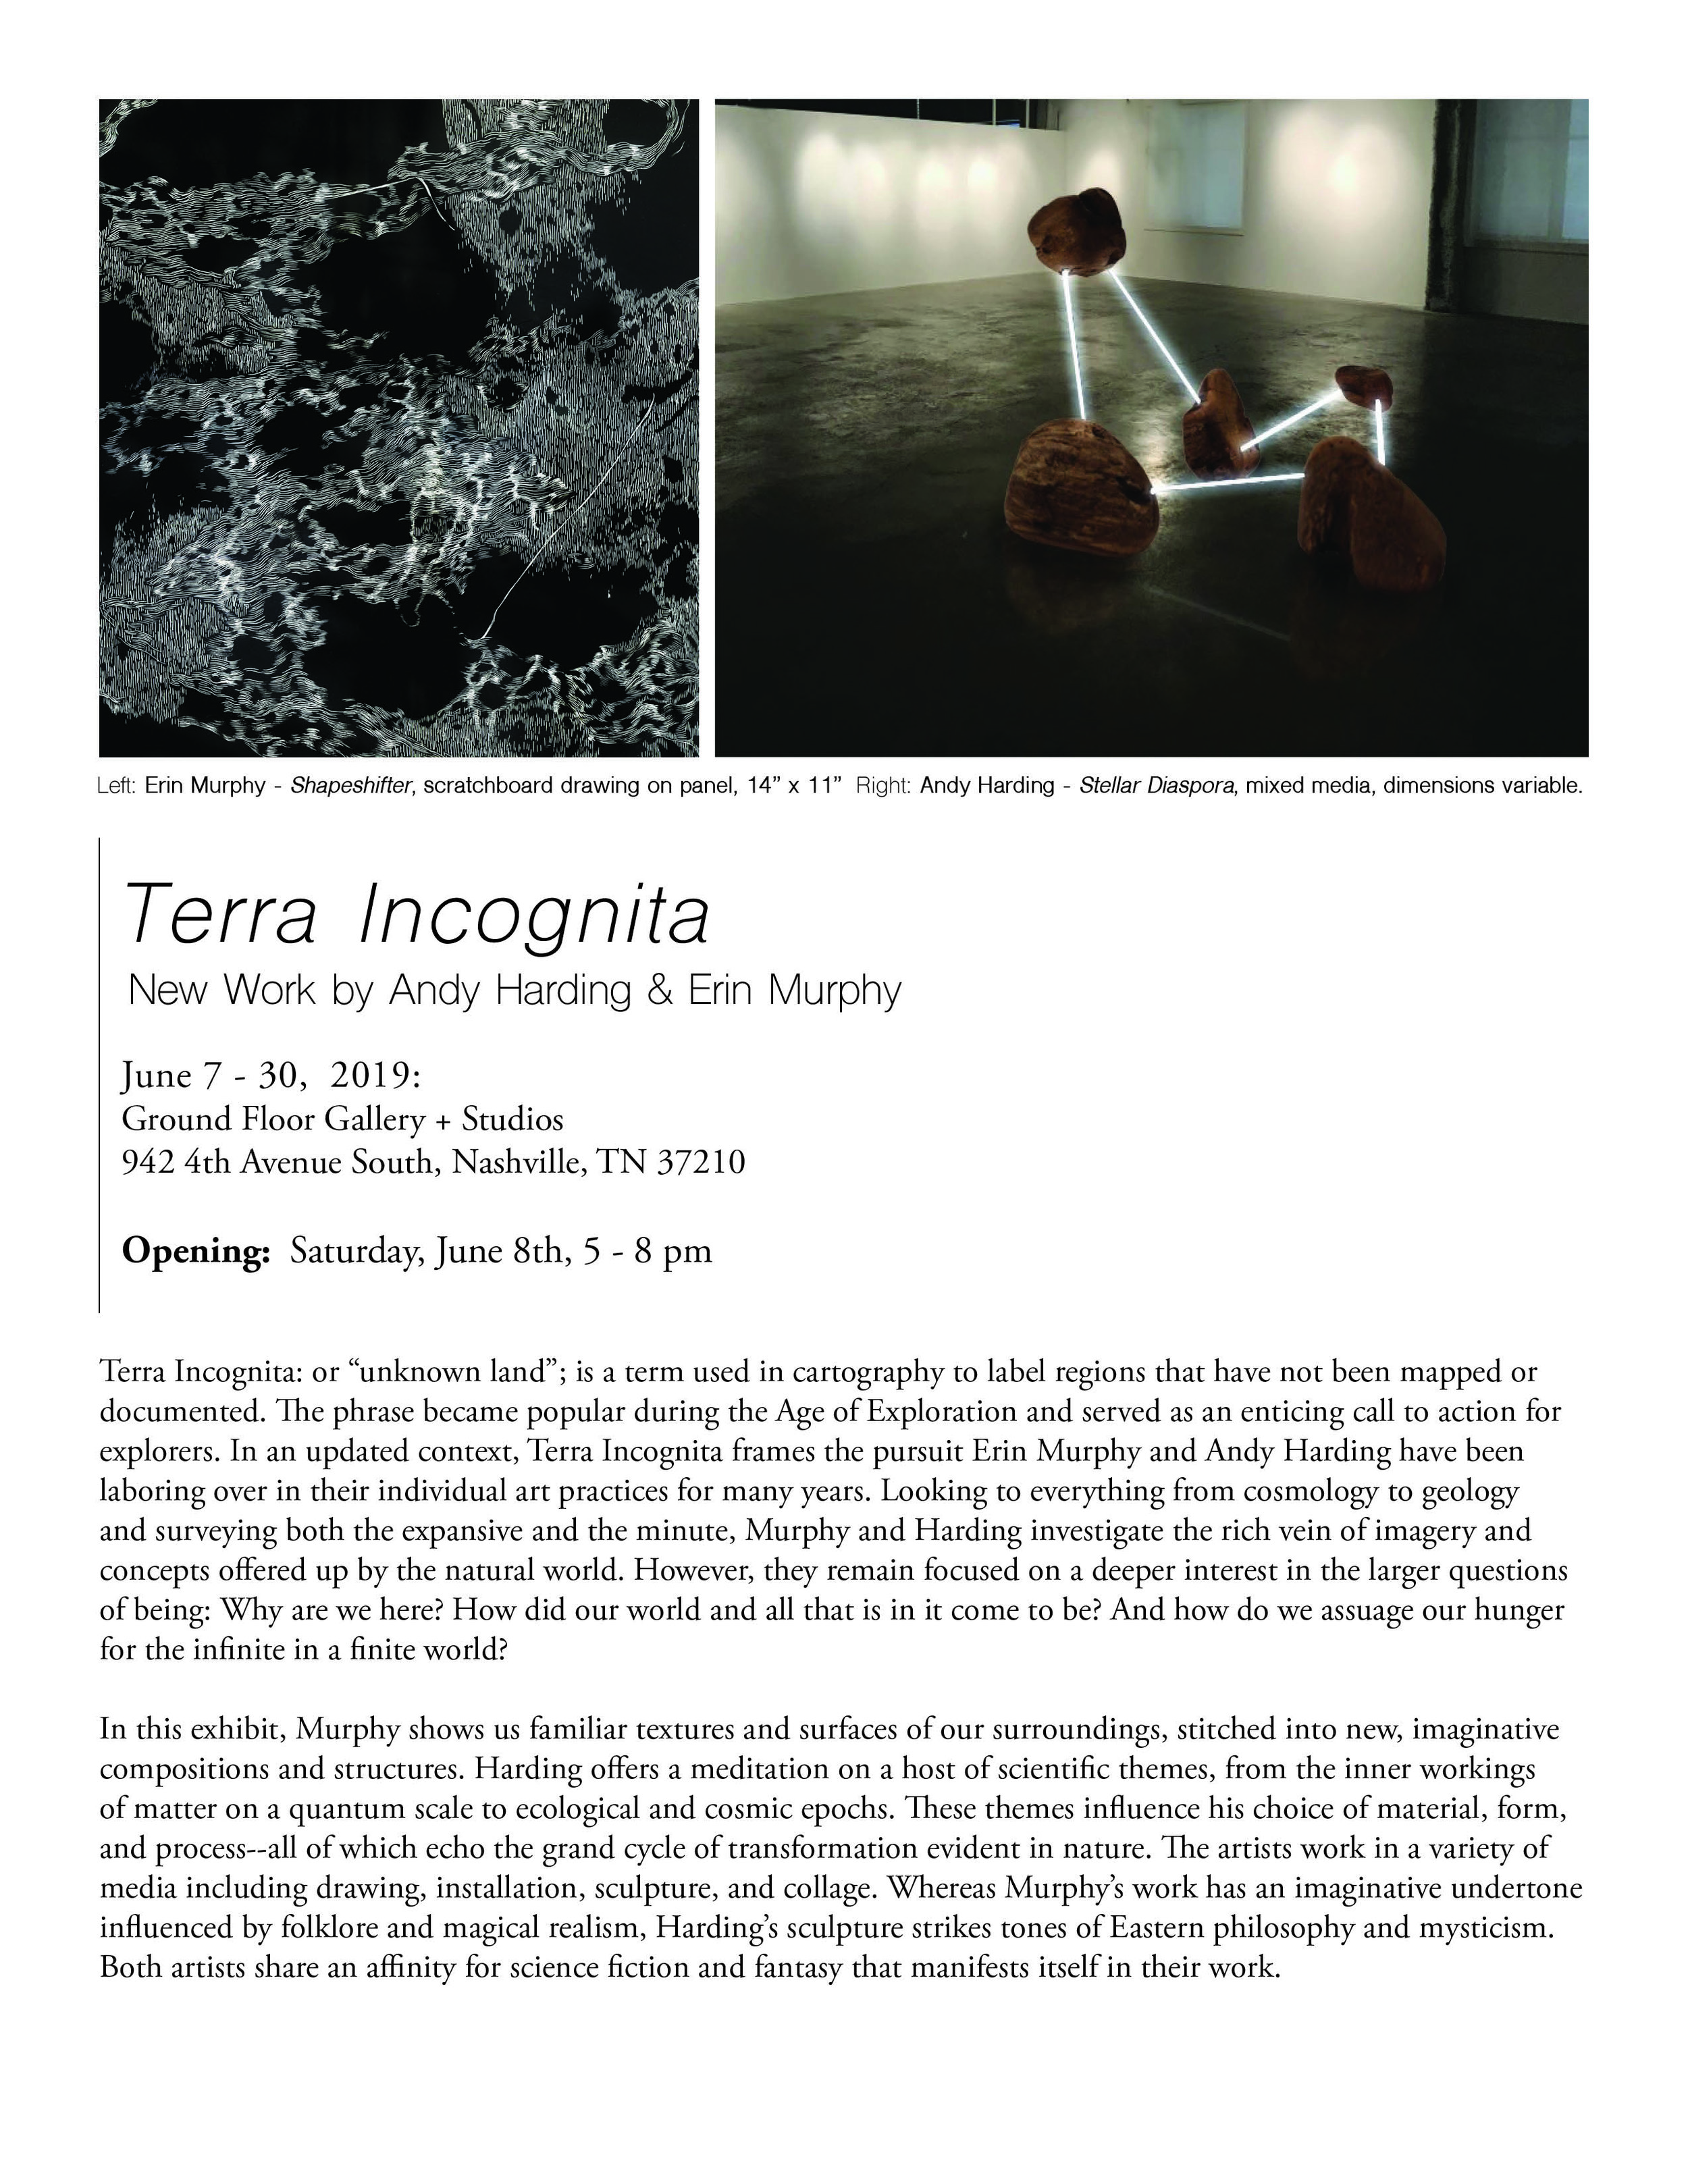 Terra Incognita Show Flyer.jpg